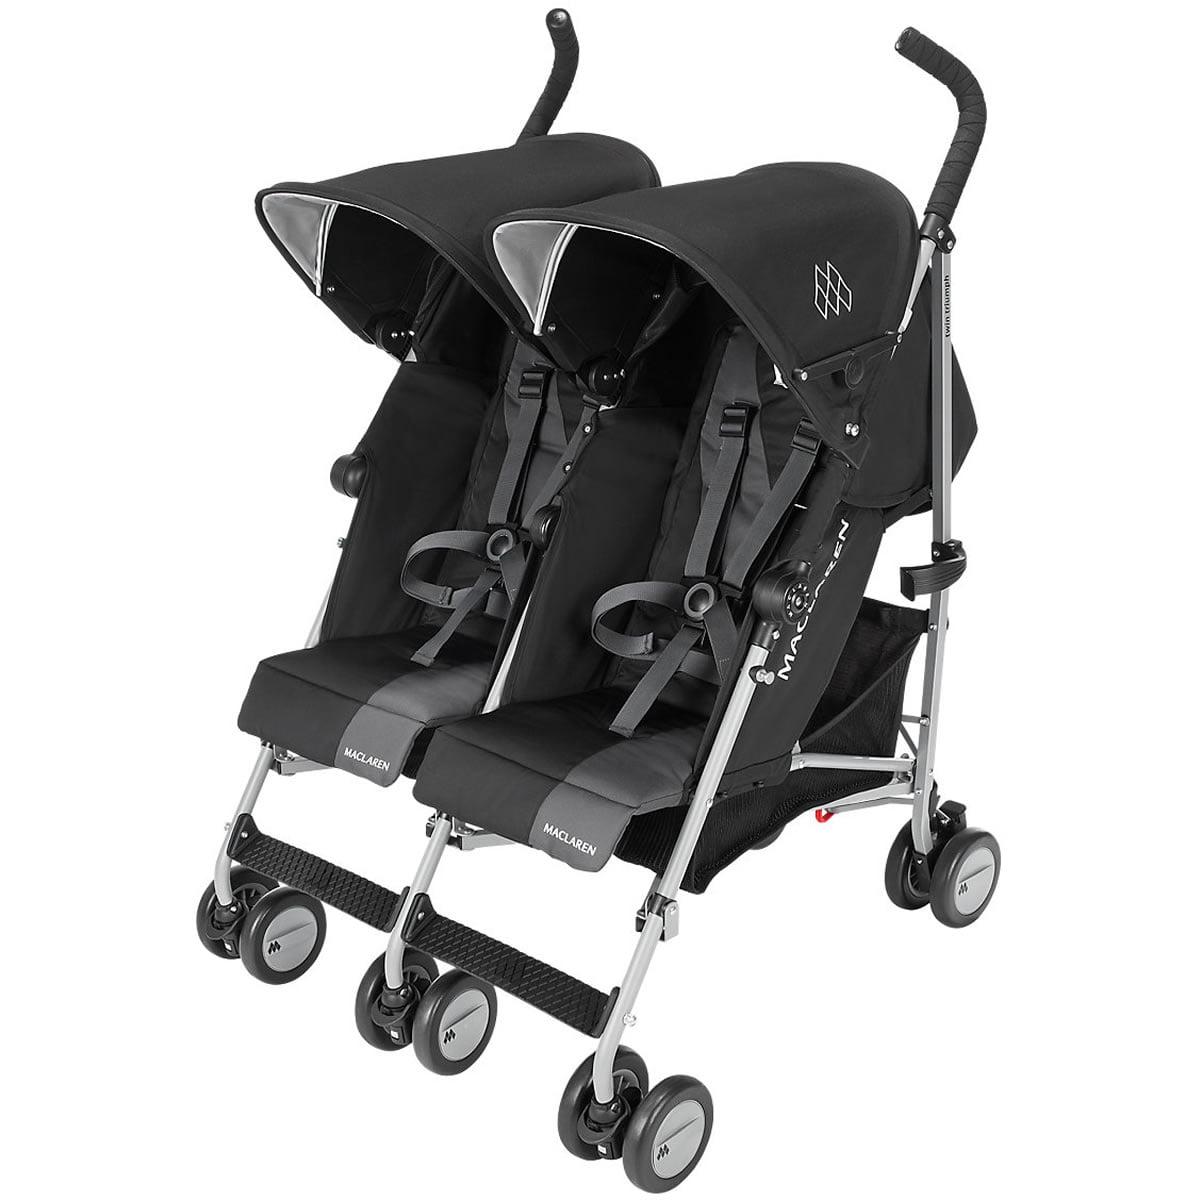 Maclaren Twin Triumph Umbrella Stroller, Black/Charcoal